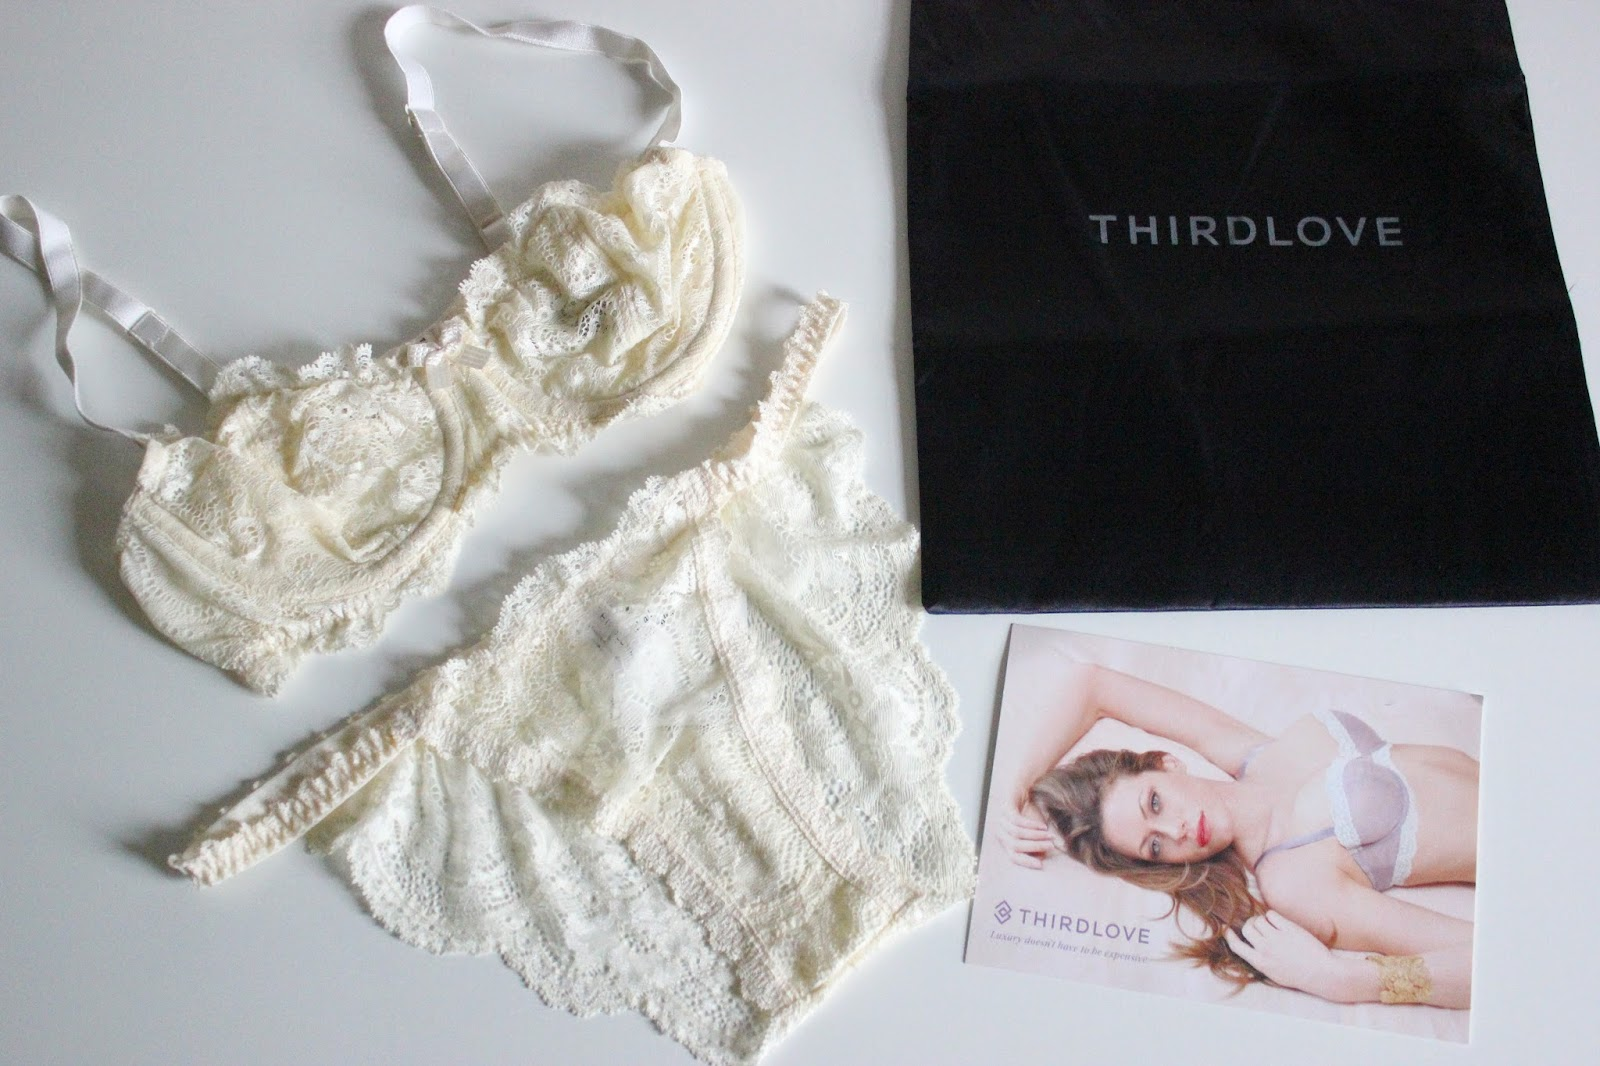 ThirdLove Lingerie Review